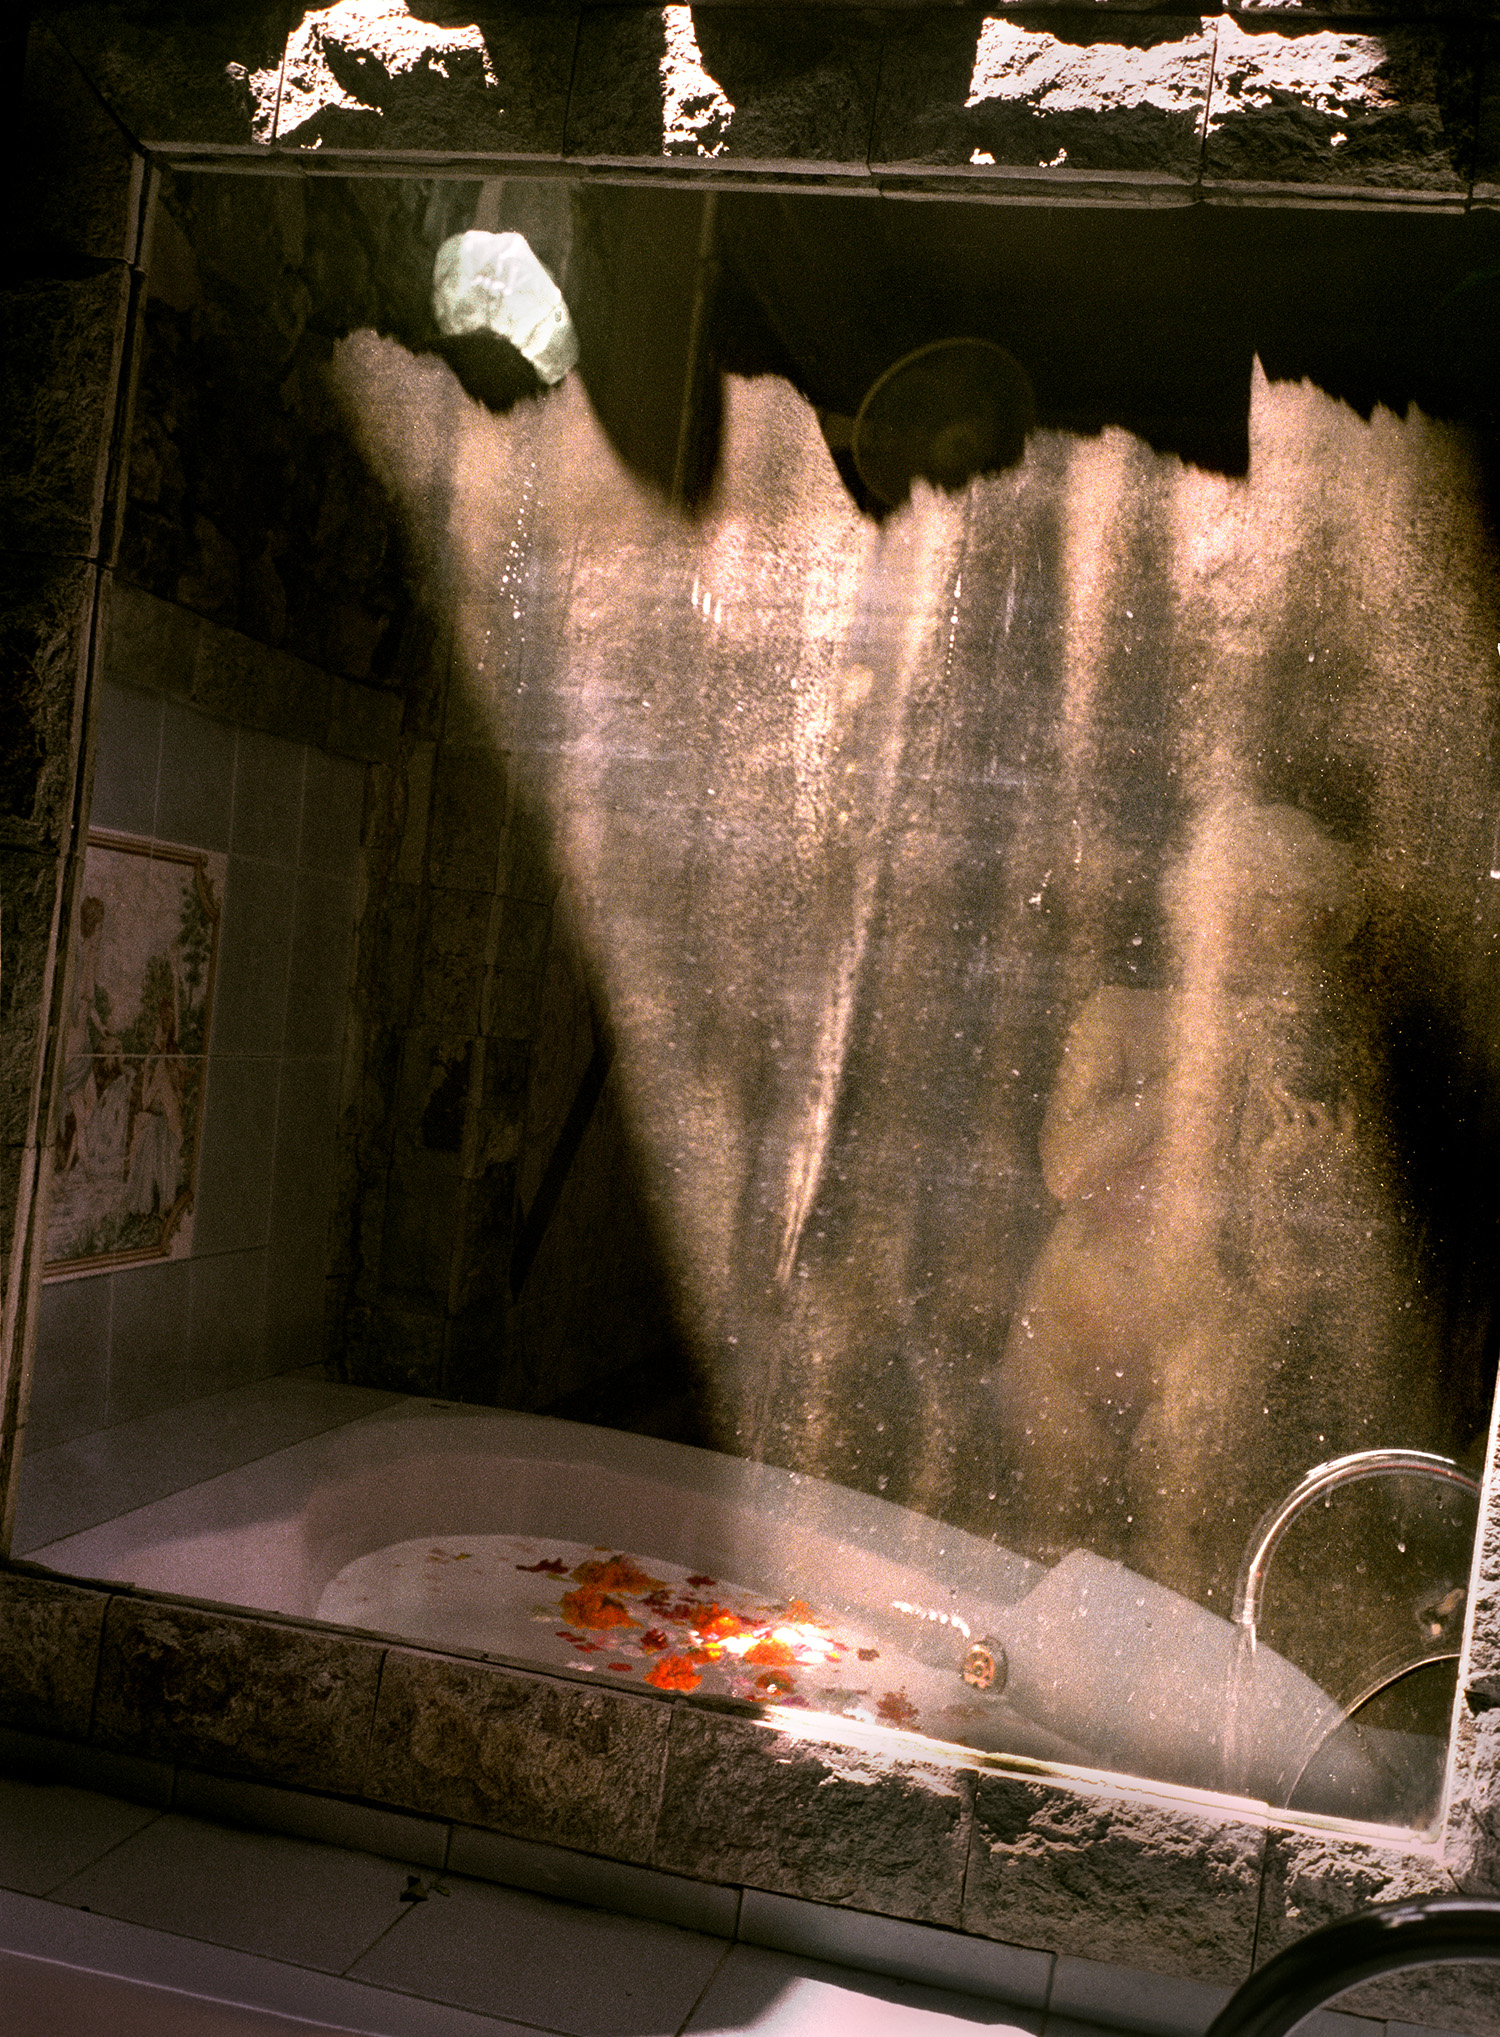 self-portrait-bodyworks-bath-2.jpg